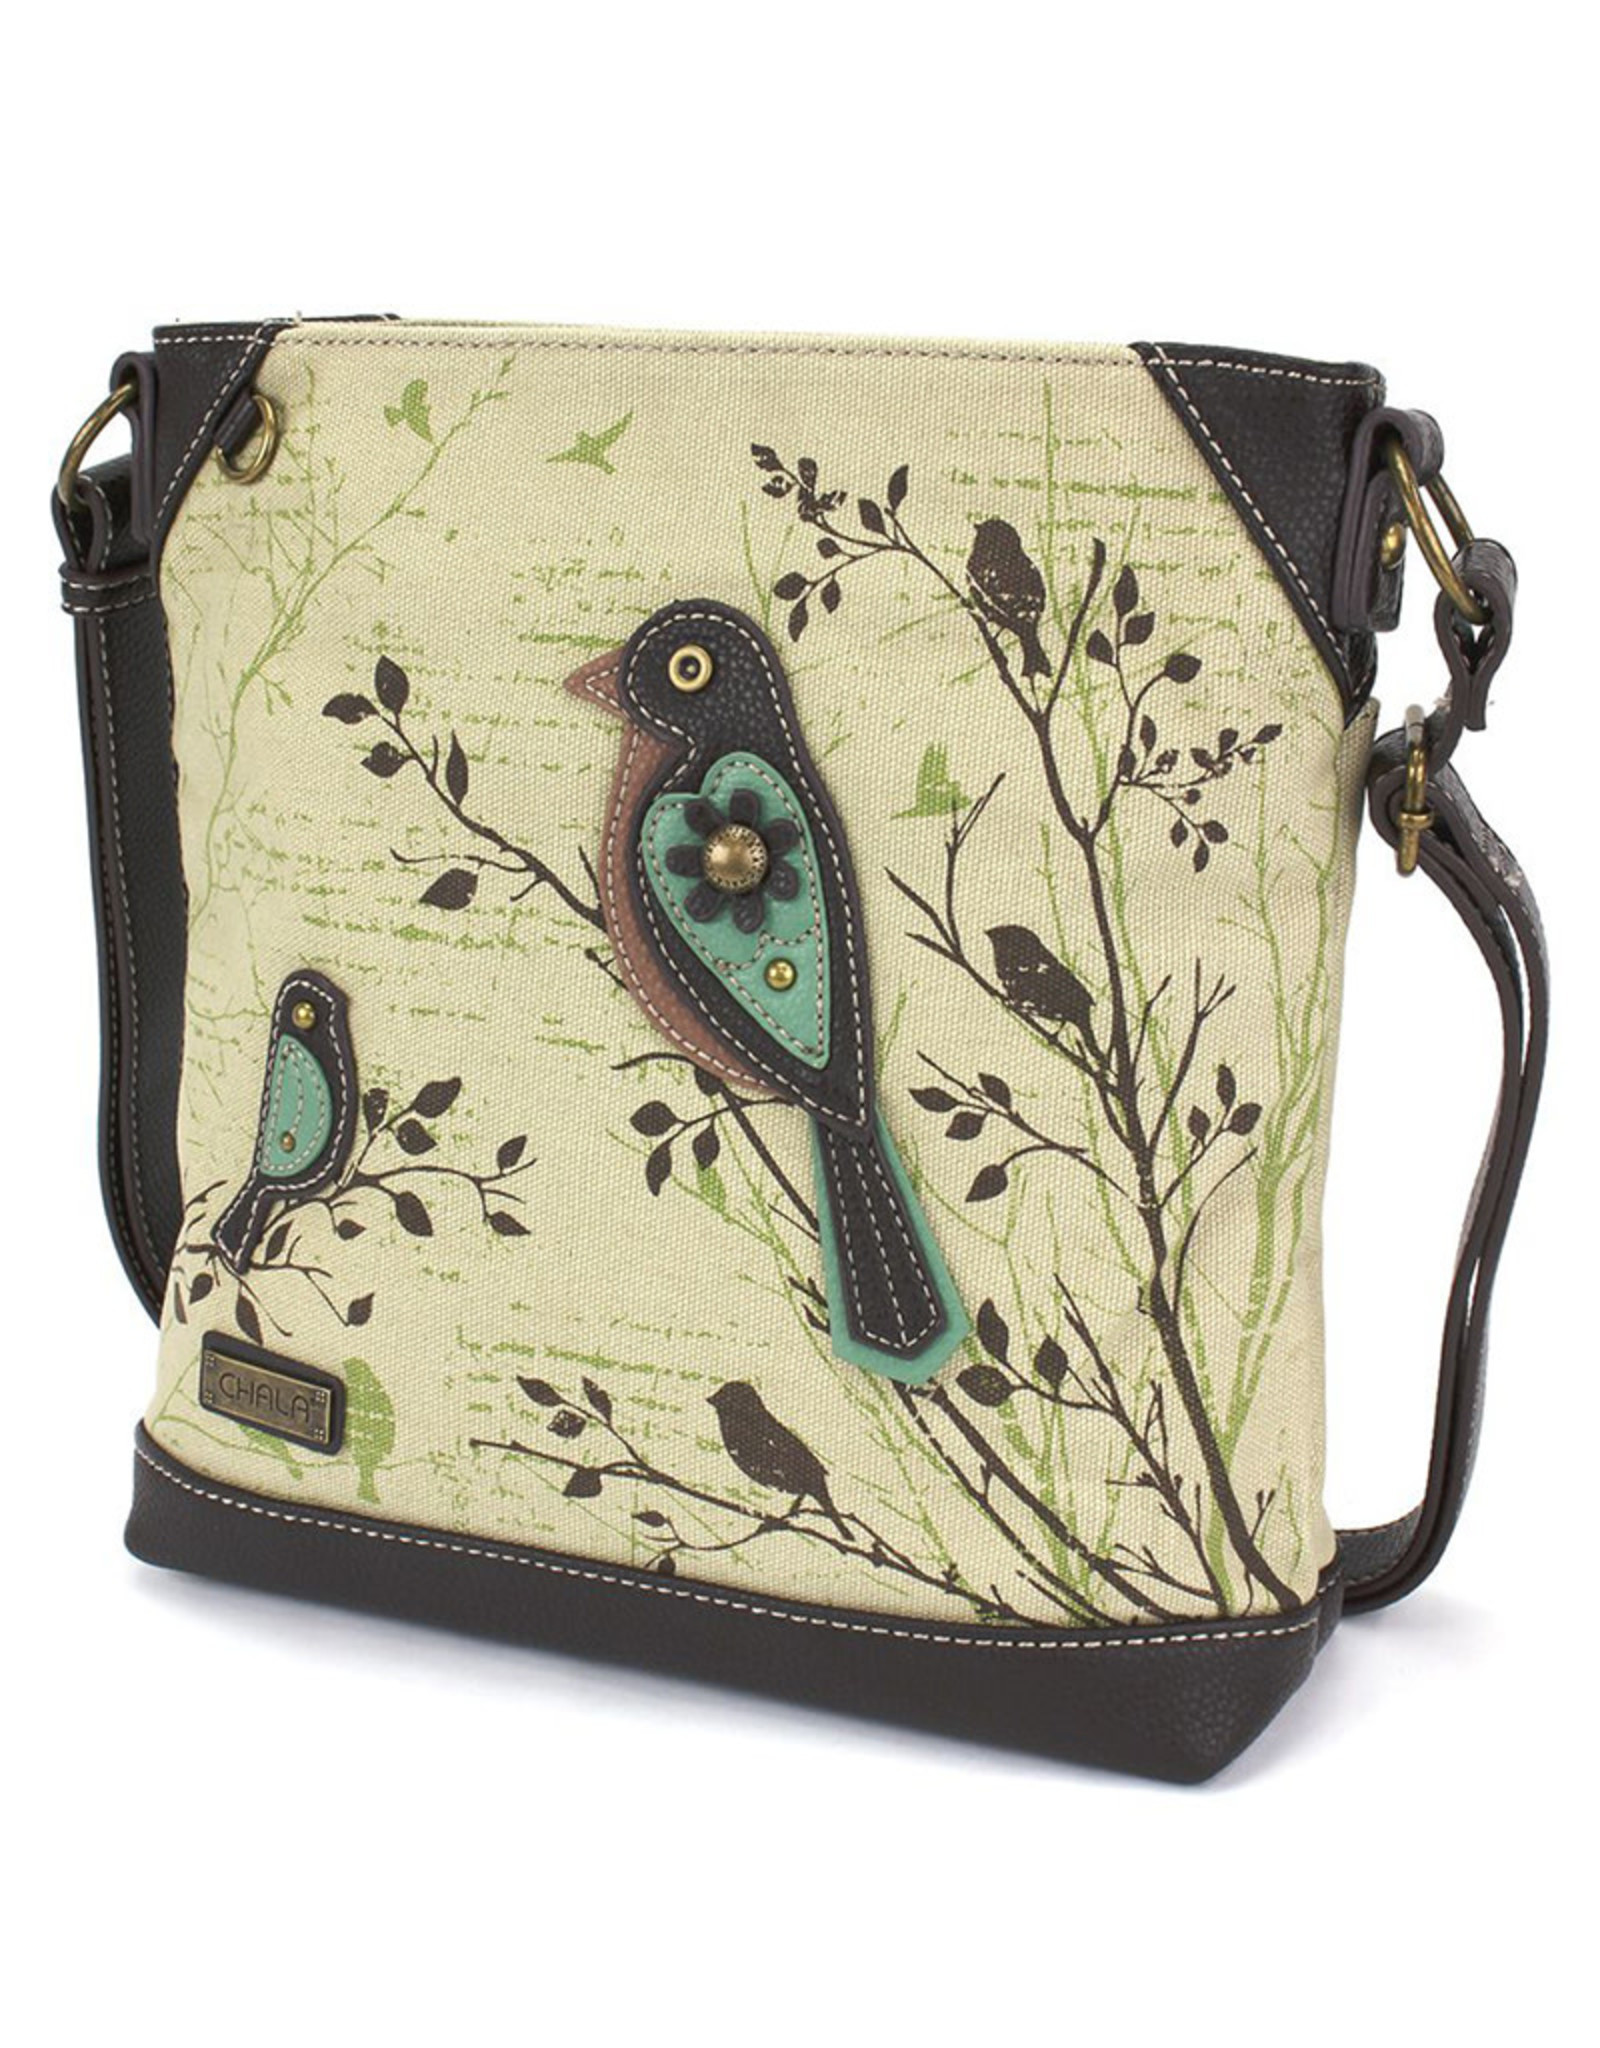 CHALA SAFARI BIRD CANVAS CROSSBODY BAG